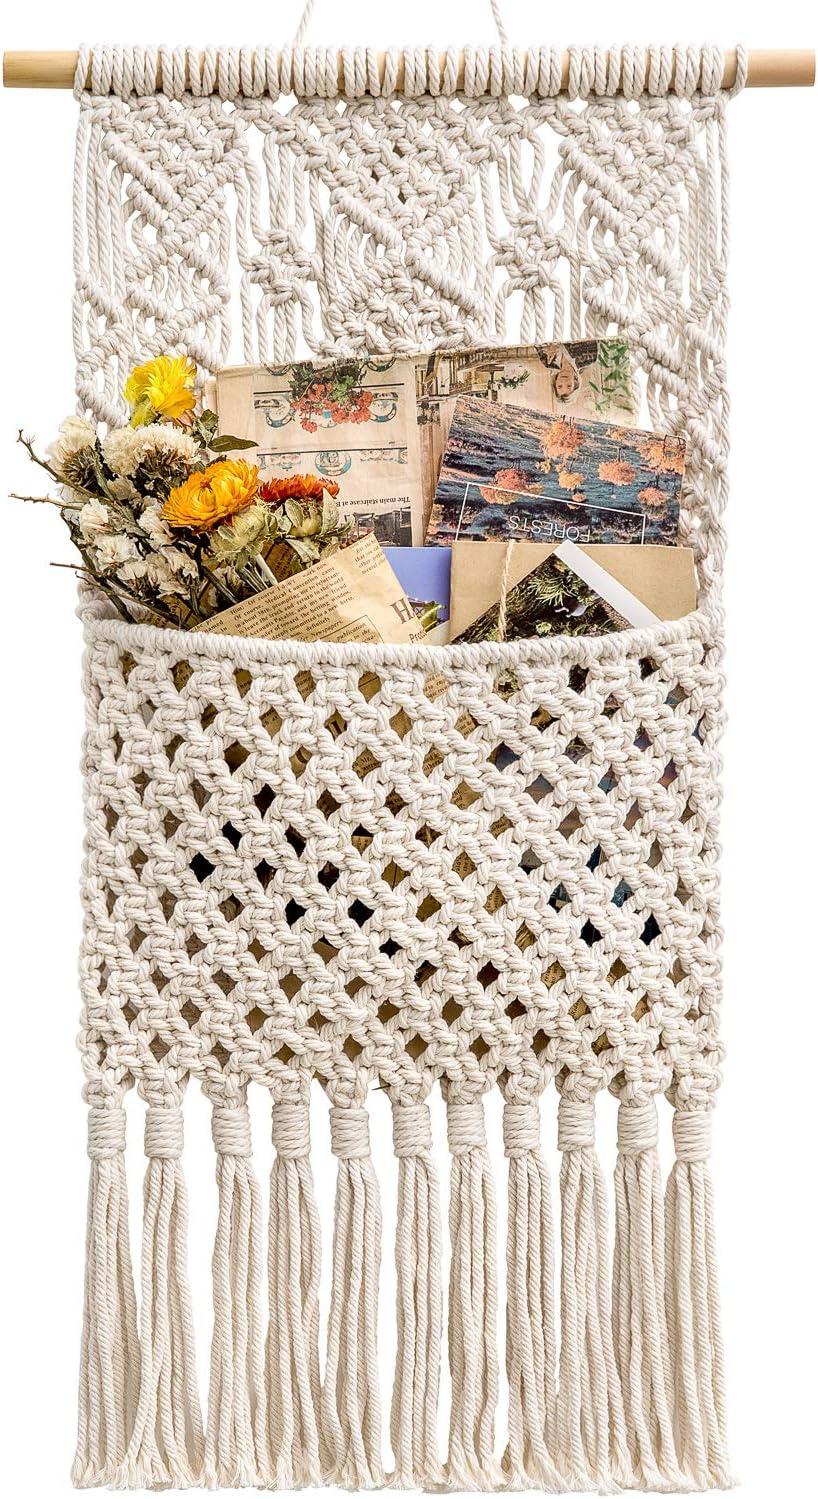 Decorative Magazines and Books Holder Bohemian Rustic Home Decor Towel Storage Basket Handmade Boho Room Decor for Bedroom Living Room Office Seagull Pattern Sunlit Boho Macrame Magazine Rack